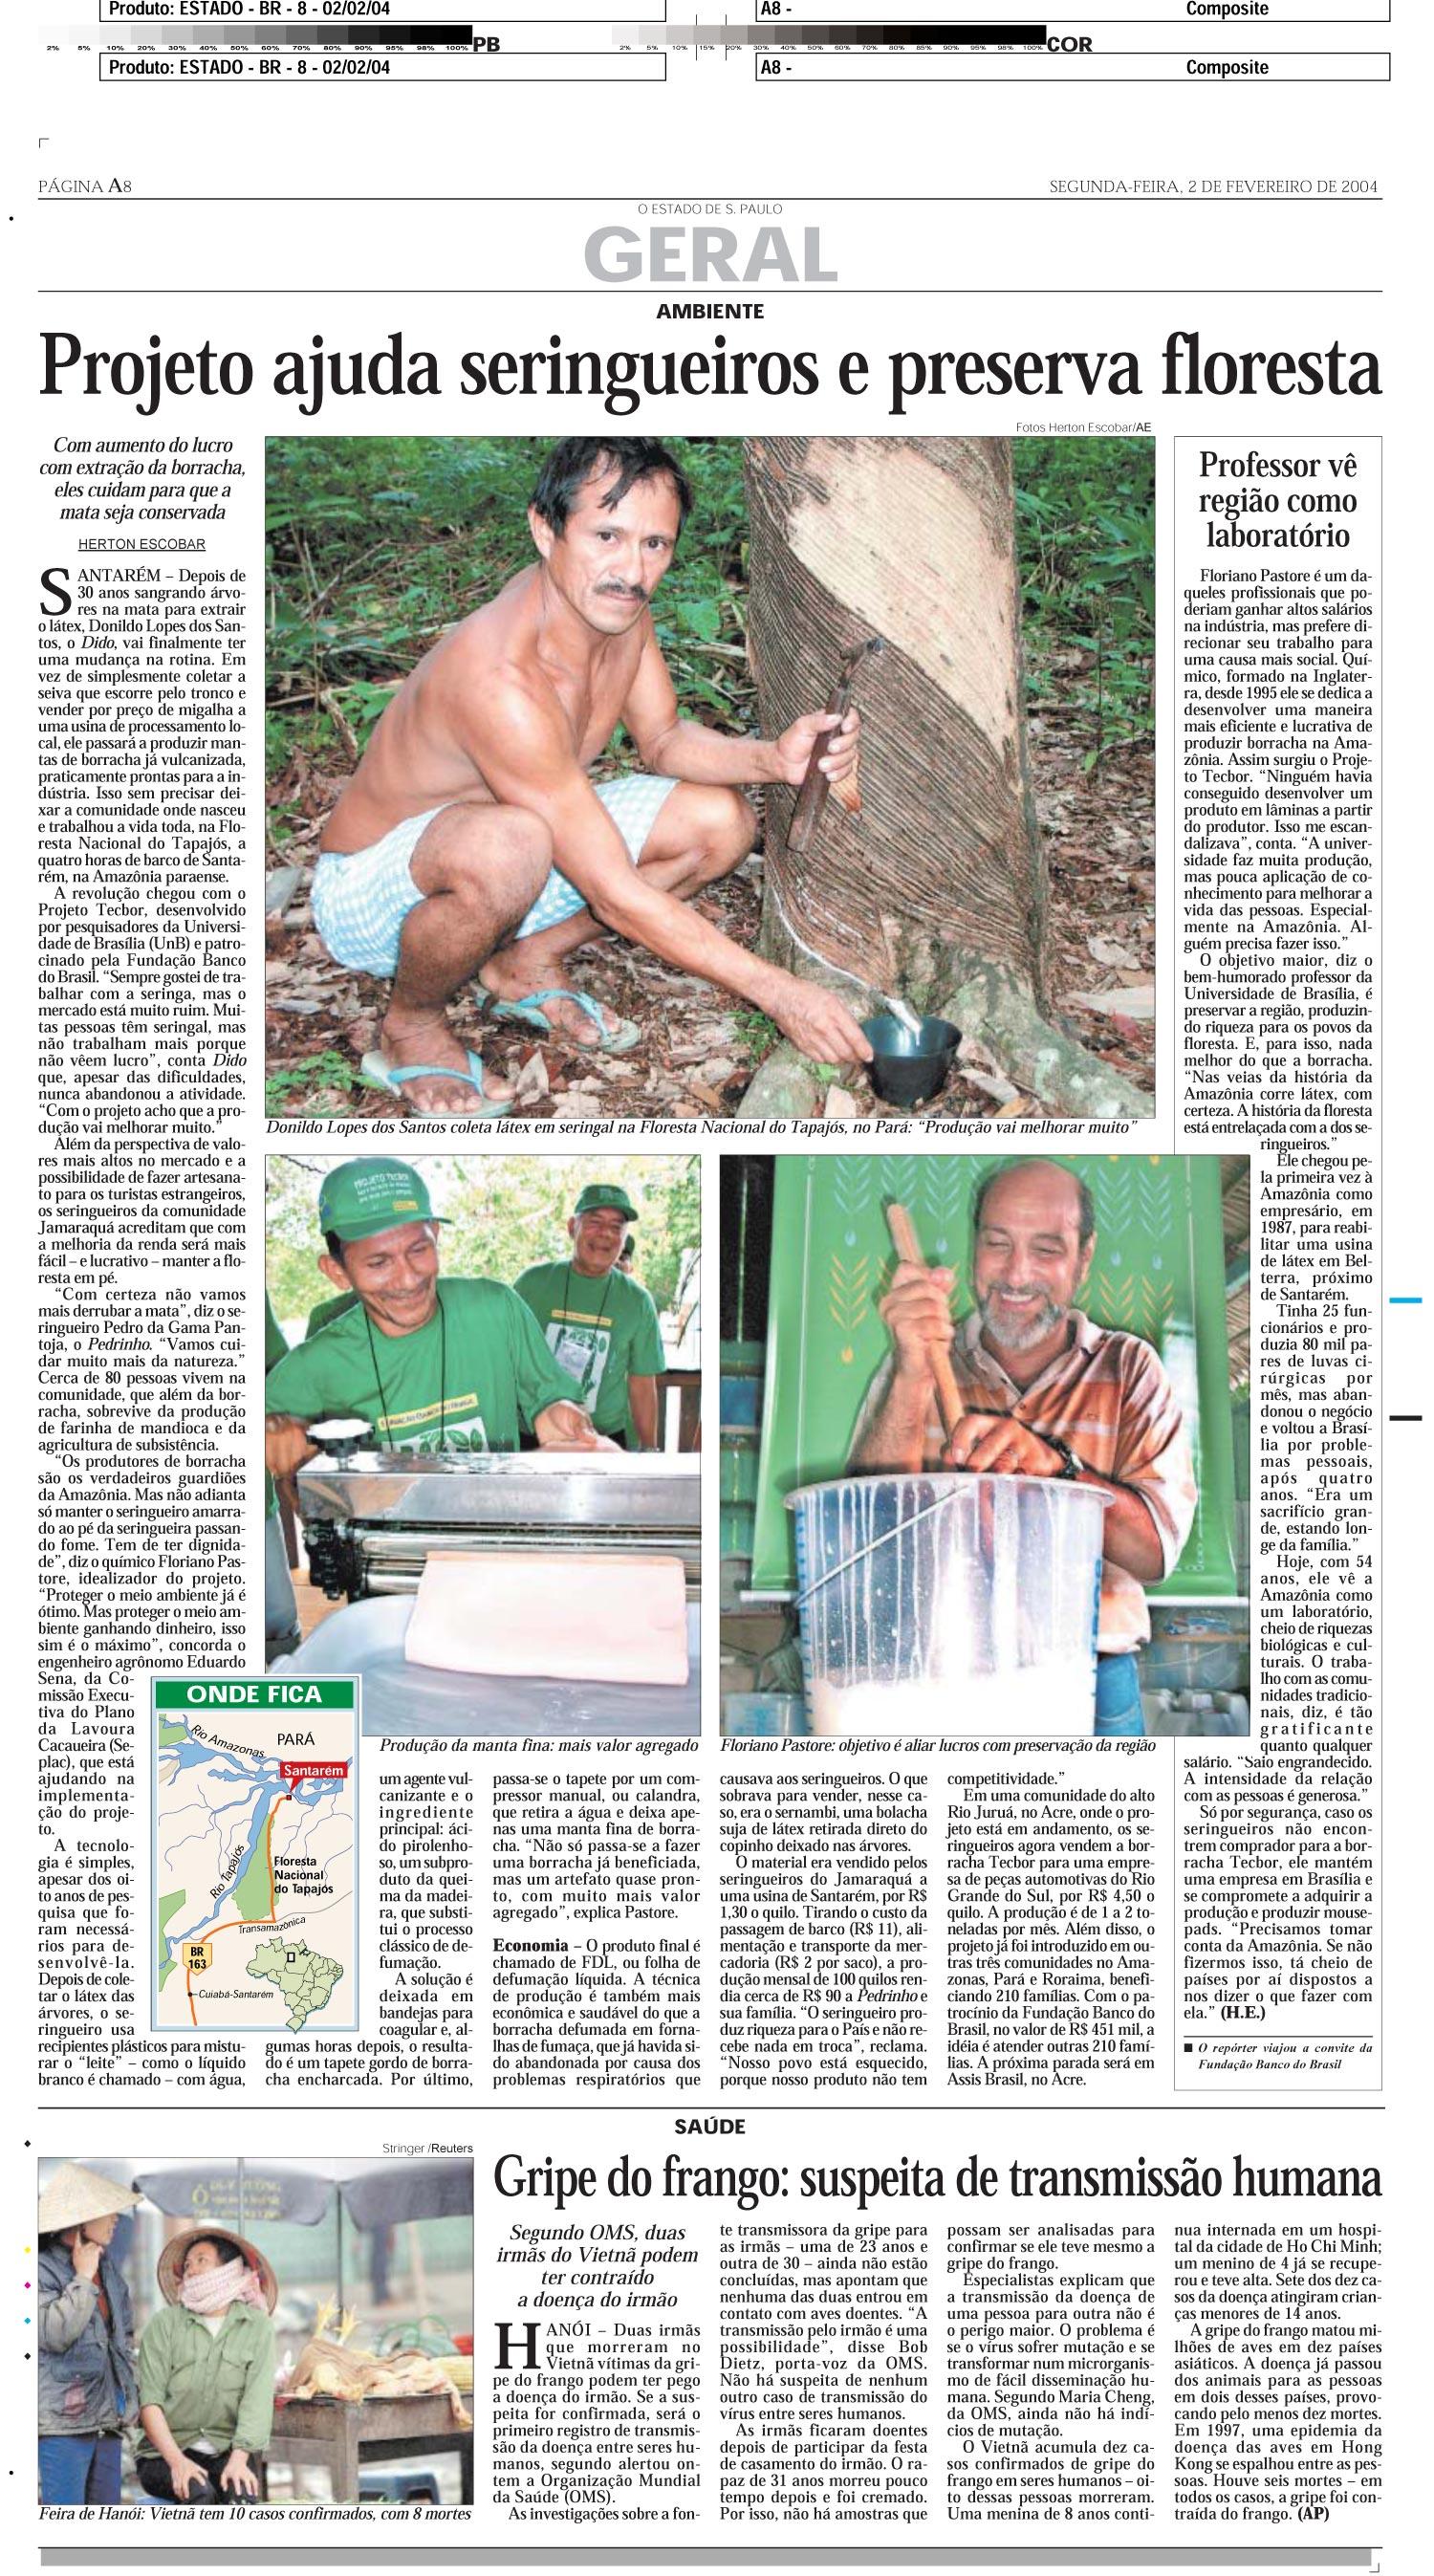 Projeto ajuda seringueiros e preserva floresta